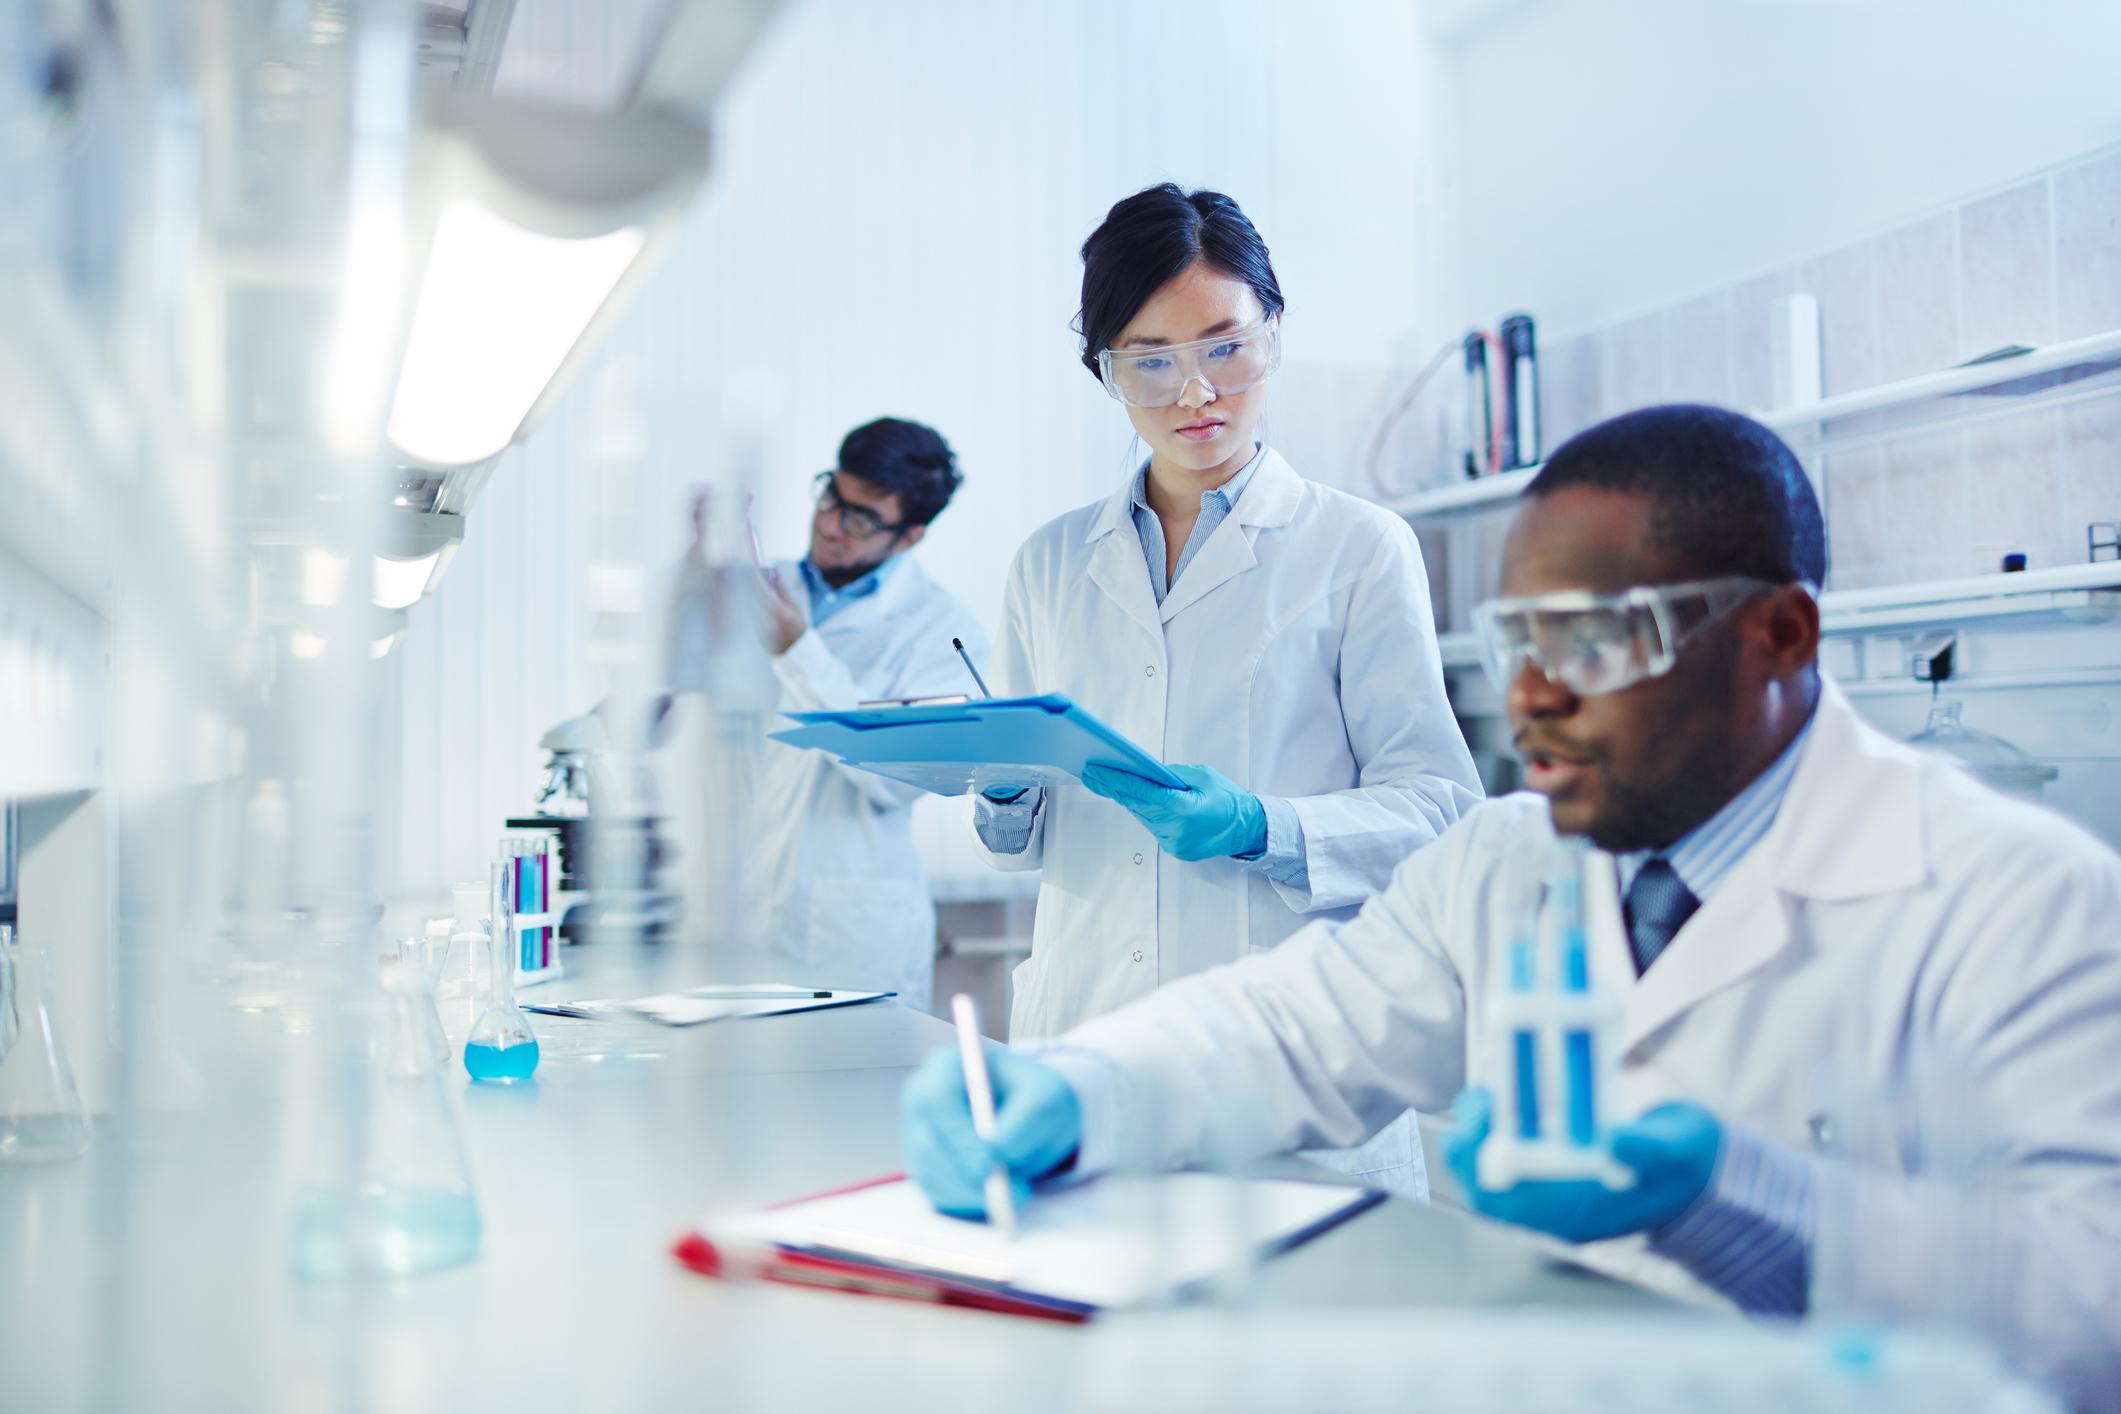 Three Scientists in a lab.